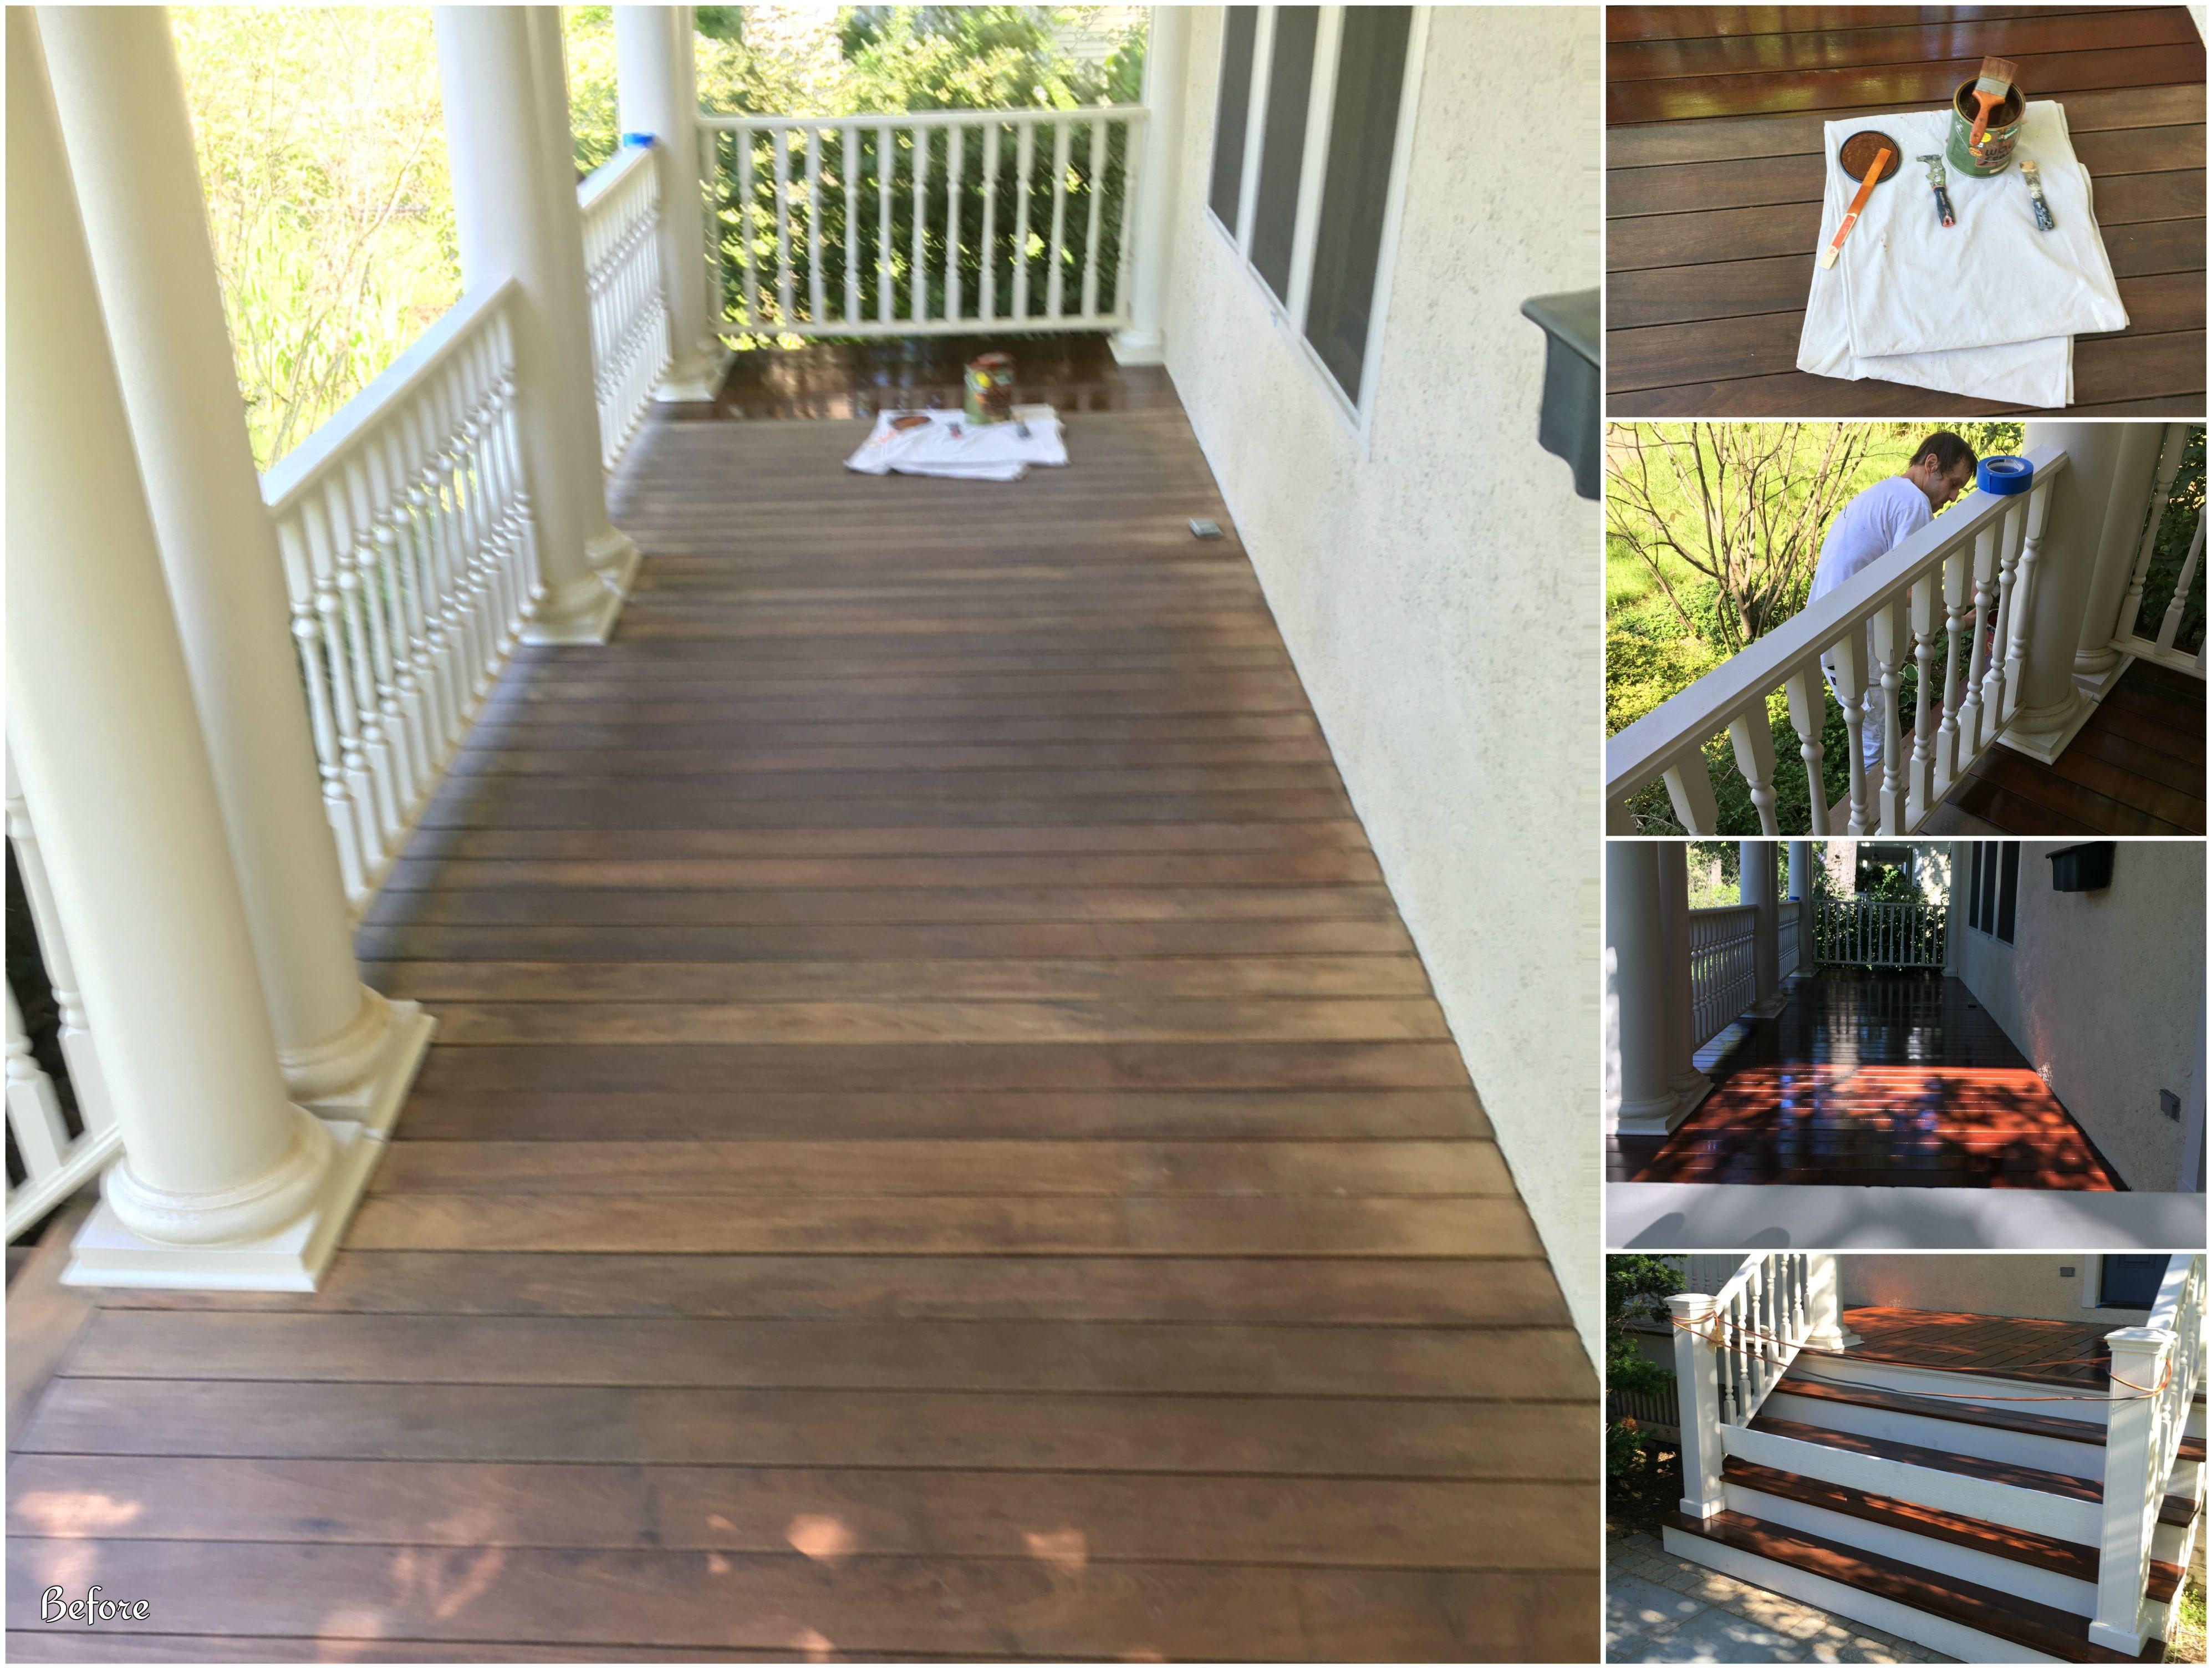 Best Benefits Of An Ipe Wood Deck Ipe Wood Deck Ipe Wood 400 x 300